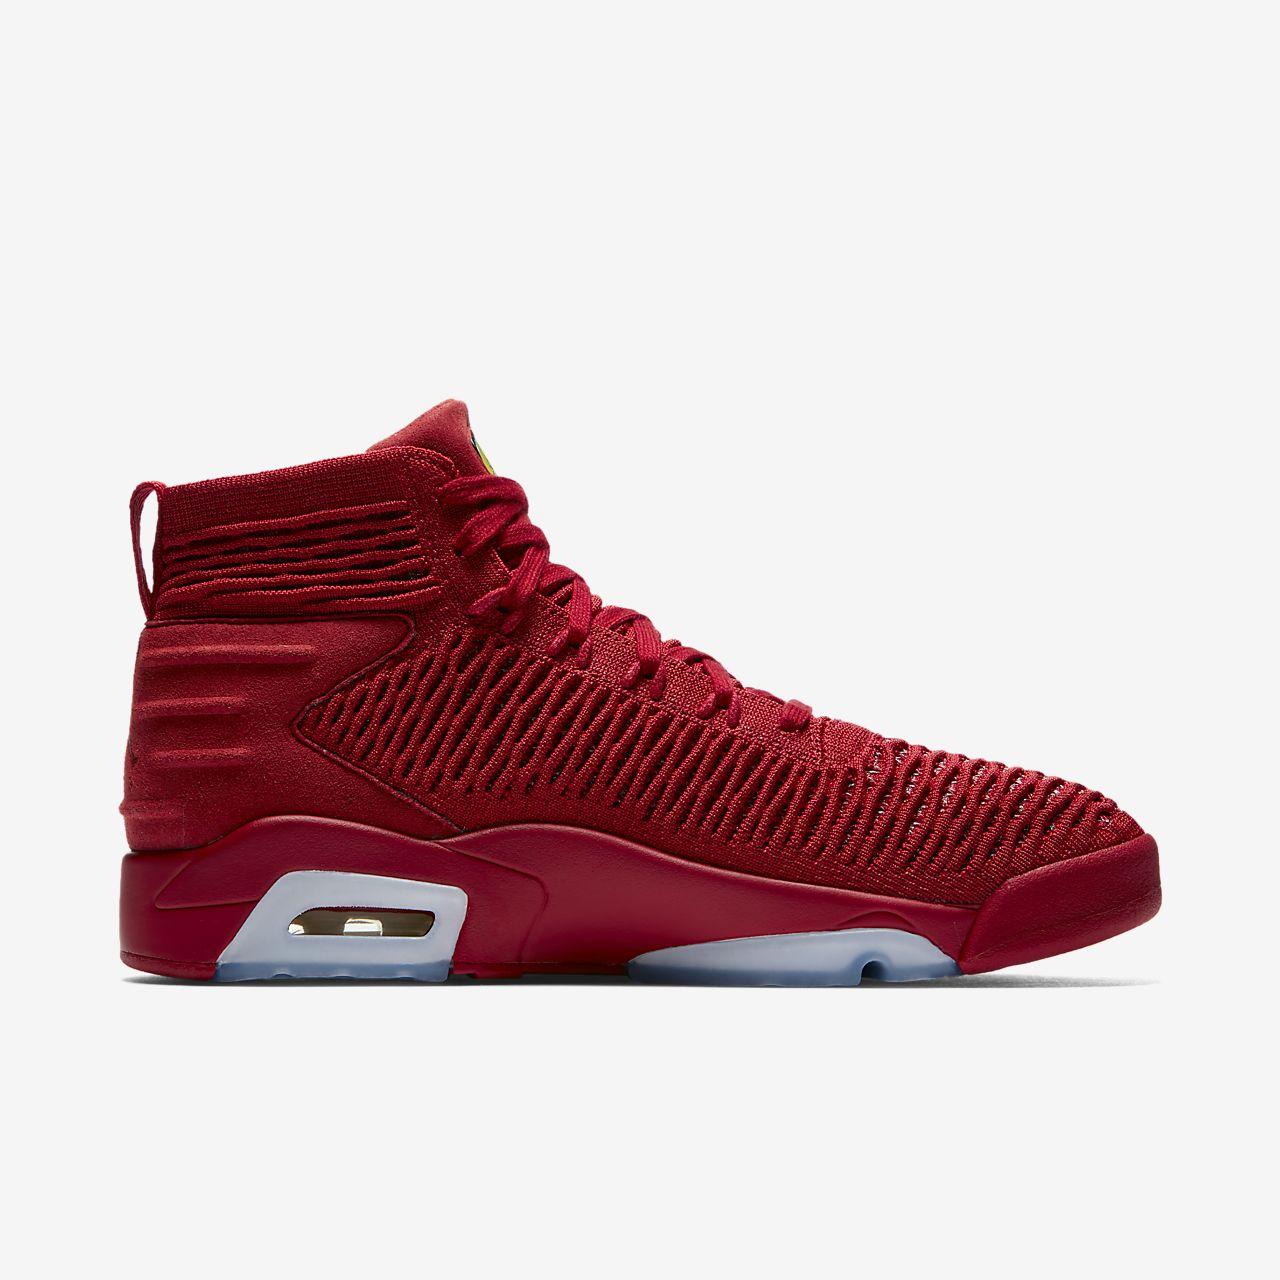 ... Chaussure Jordan Flyknit Elevation 23 pour Homme